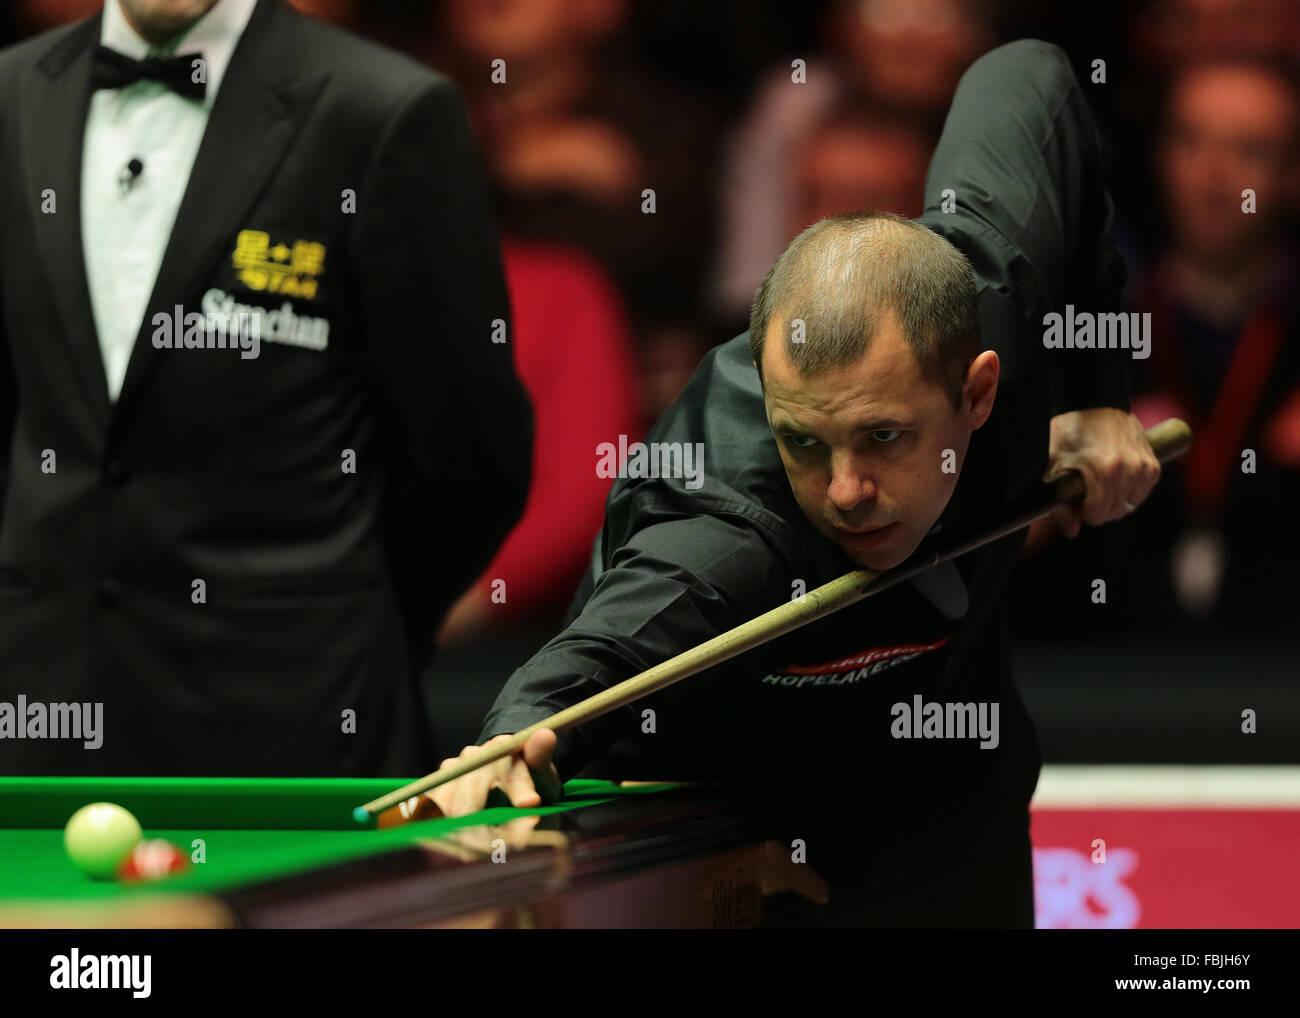 Alexandra Palace, London, UK. 17th Jan, 2016. Masters Snooker. Final, Ronnie O'Sullivan versus Barry Hawkins. - Stock Image